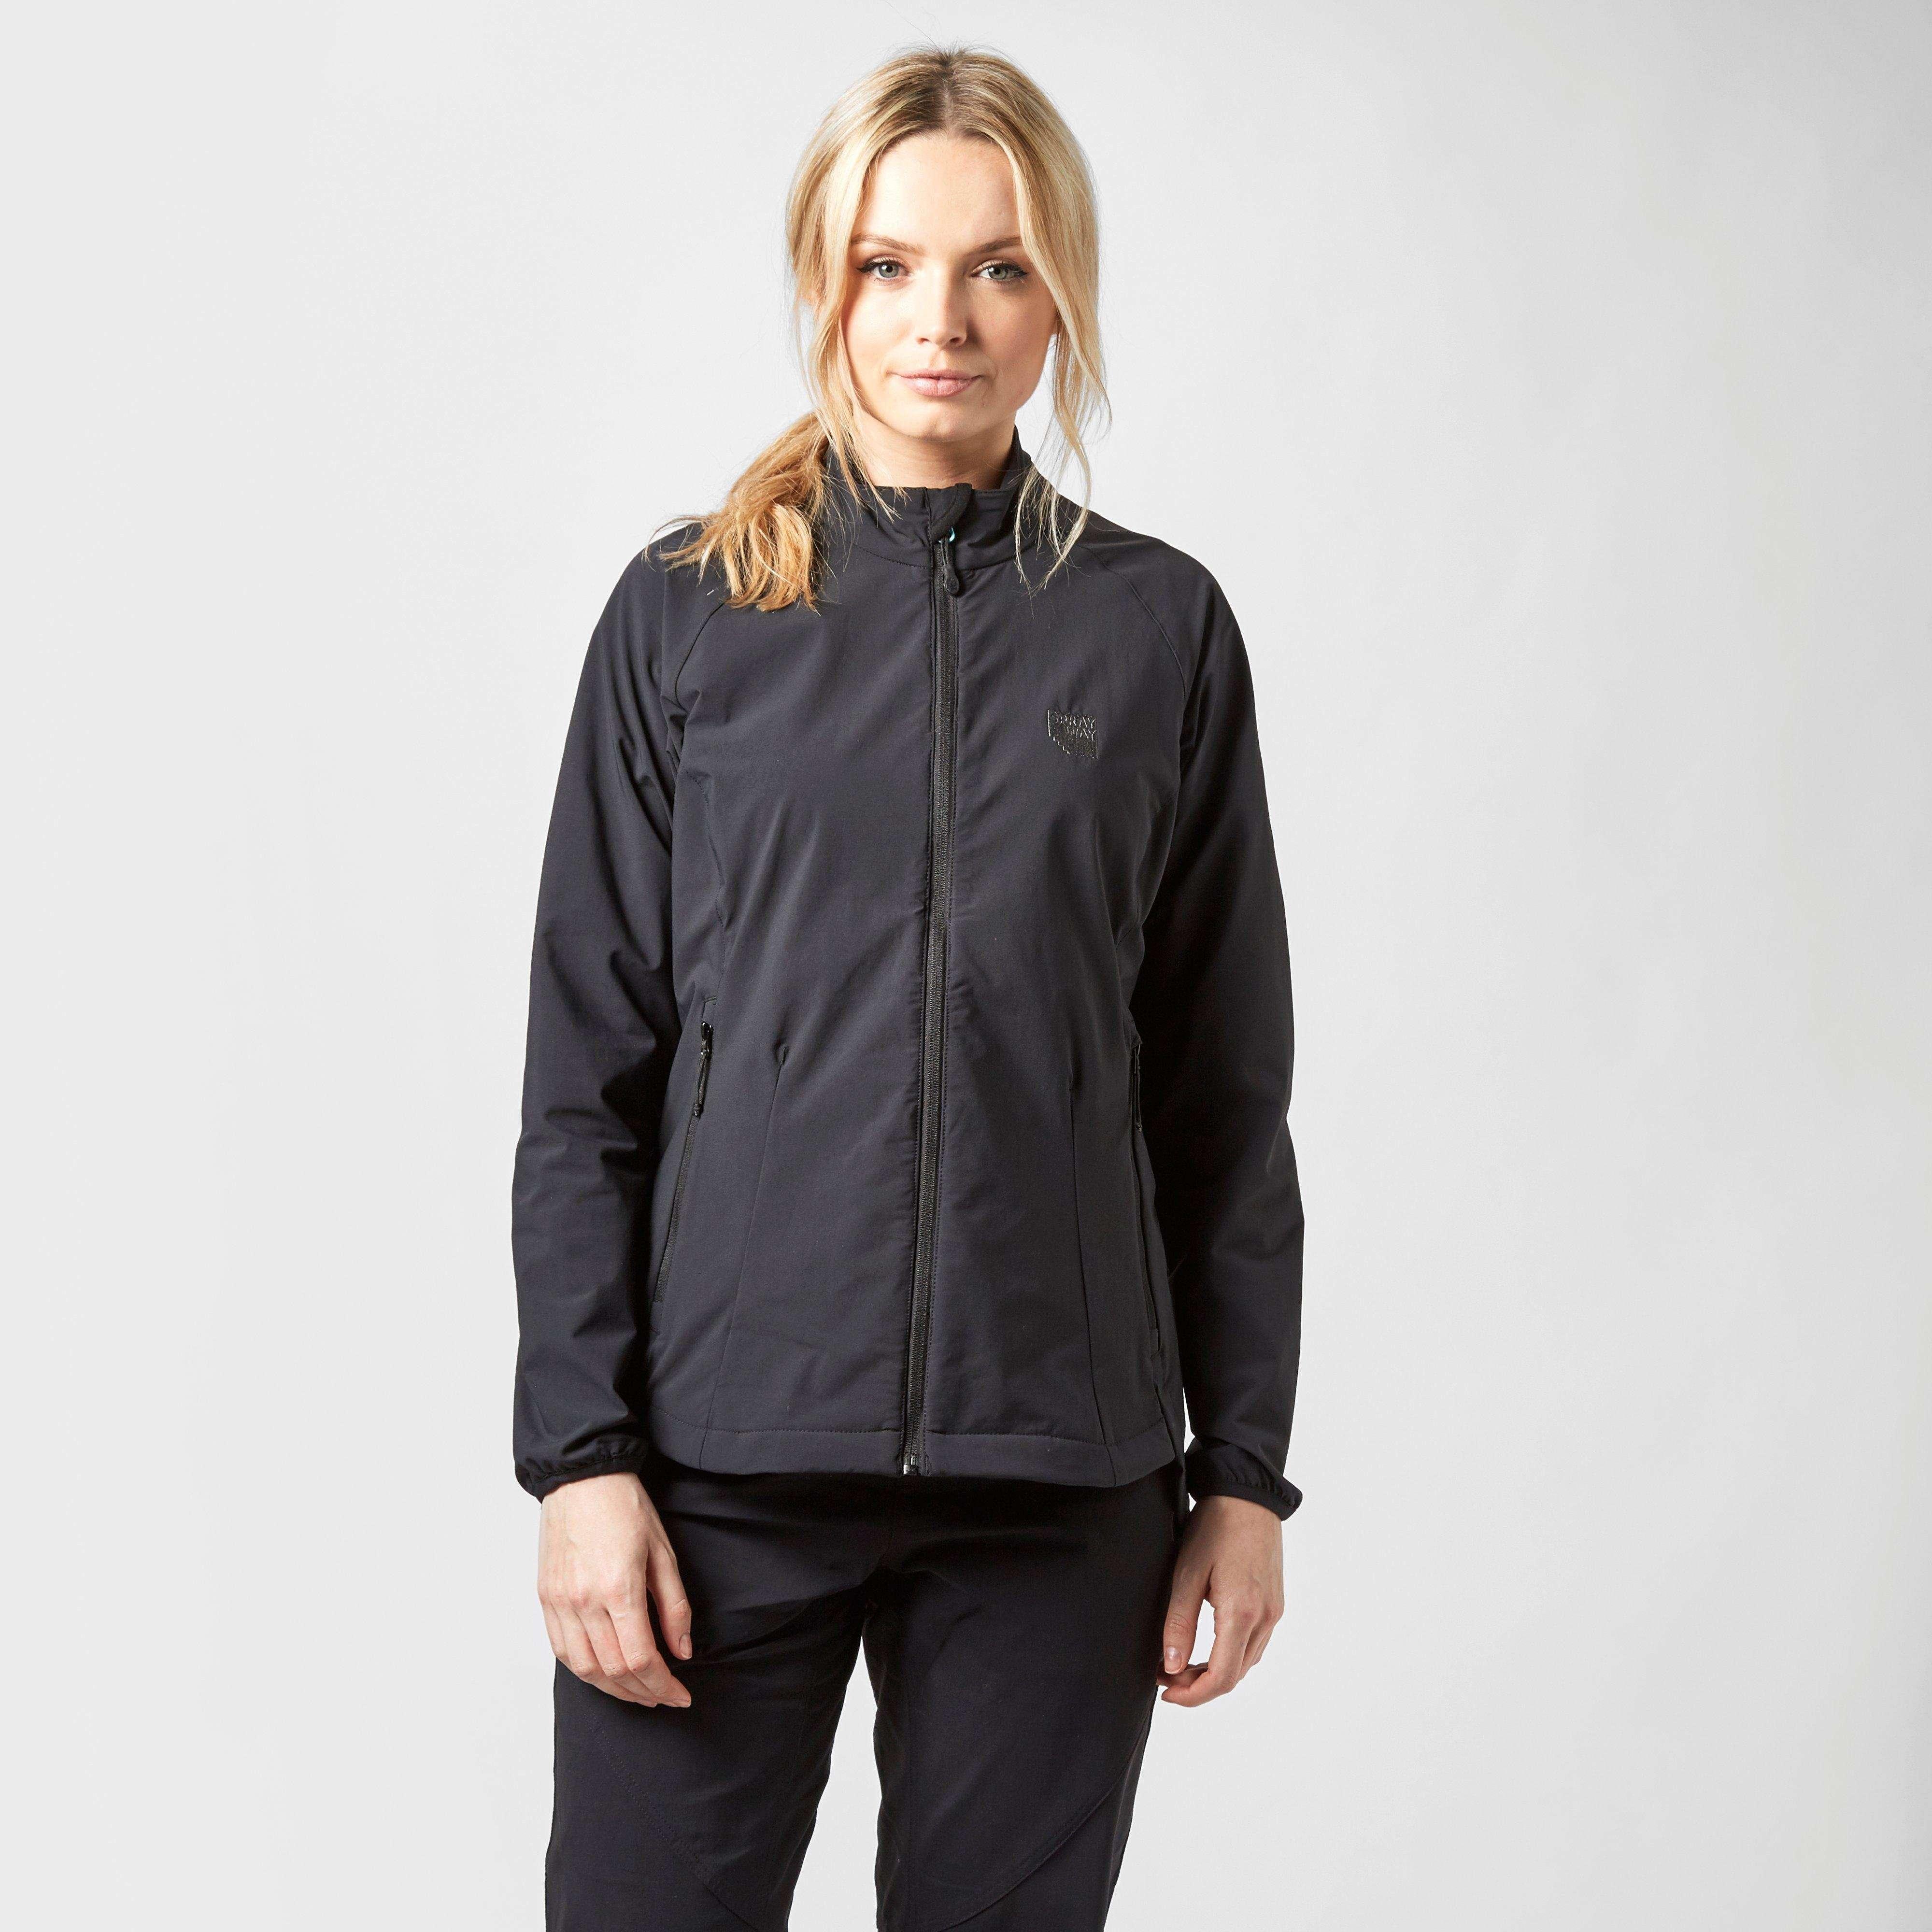 SPRAYWAY Women's Ria Softshell Jacket